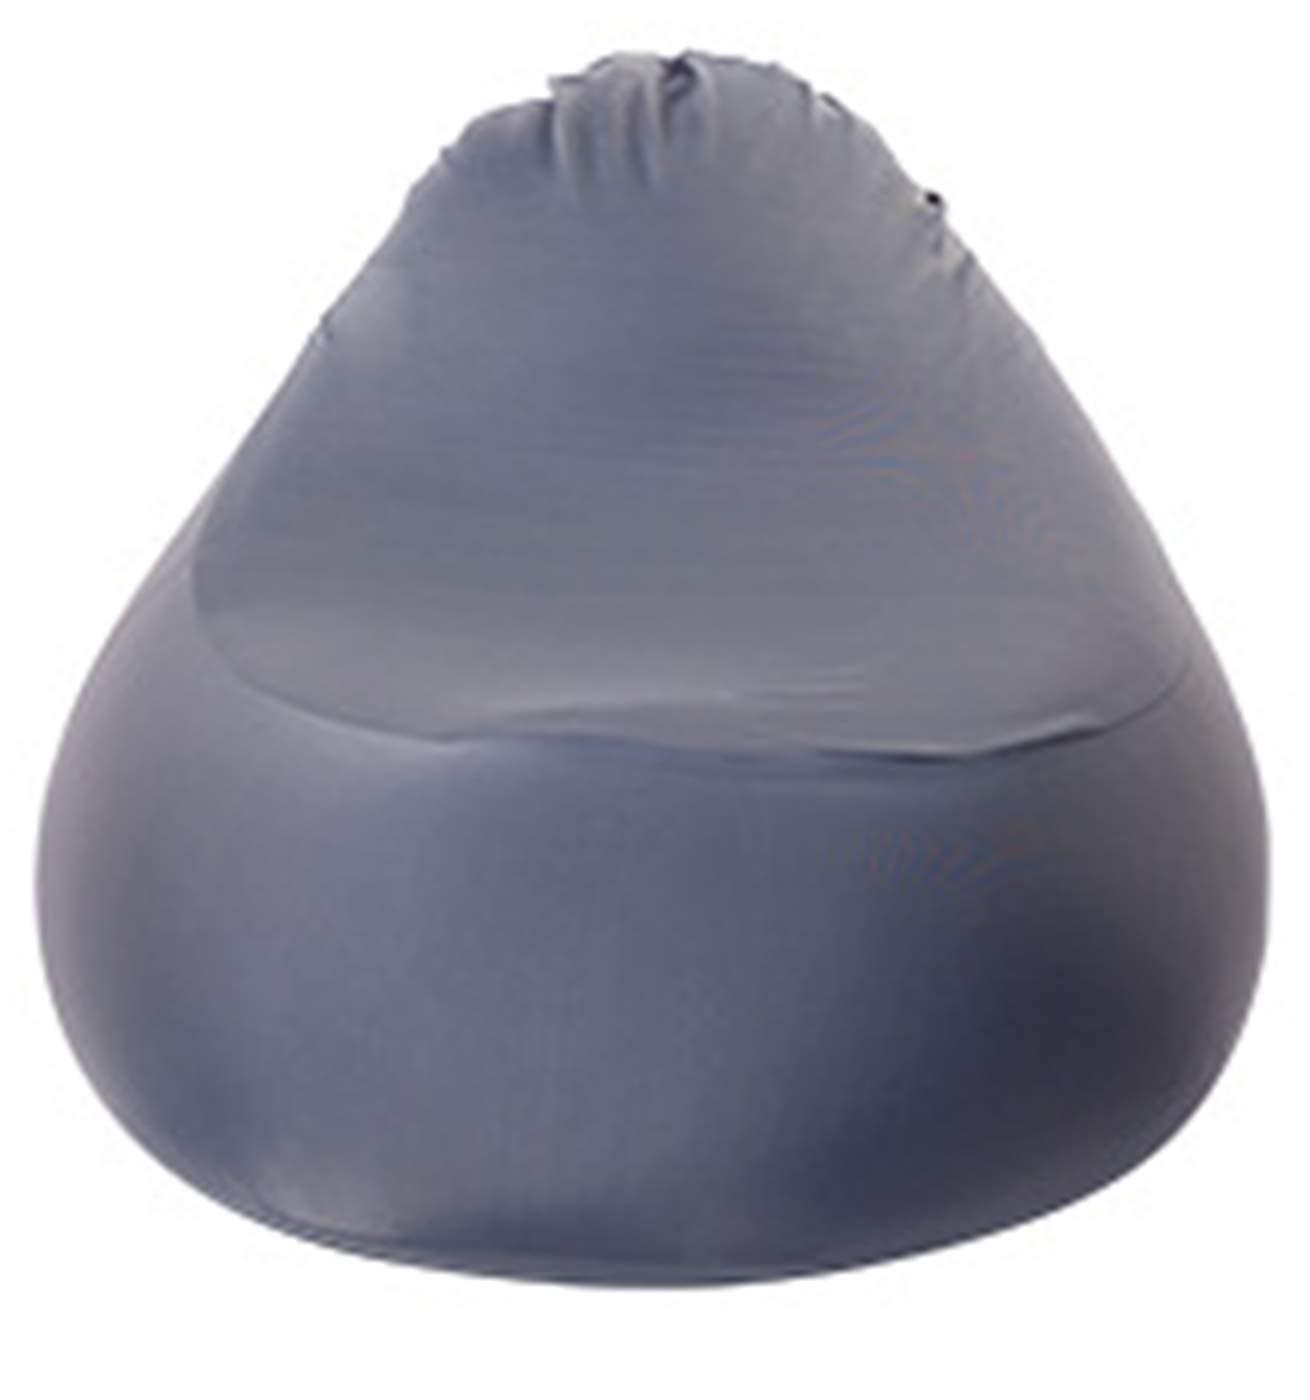 MZS Tec Bean Bag Chair, Stretch Cotton Single Tatami Chair Leisure Living Room Balcony Bedroom Bean Bag (Gray)